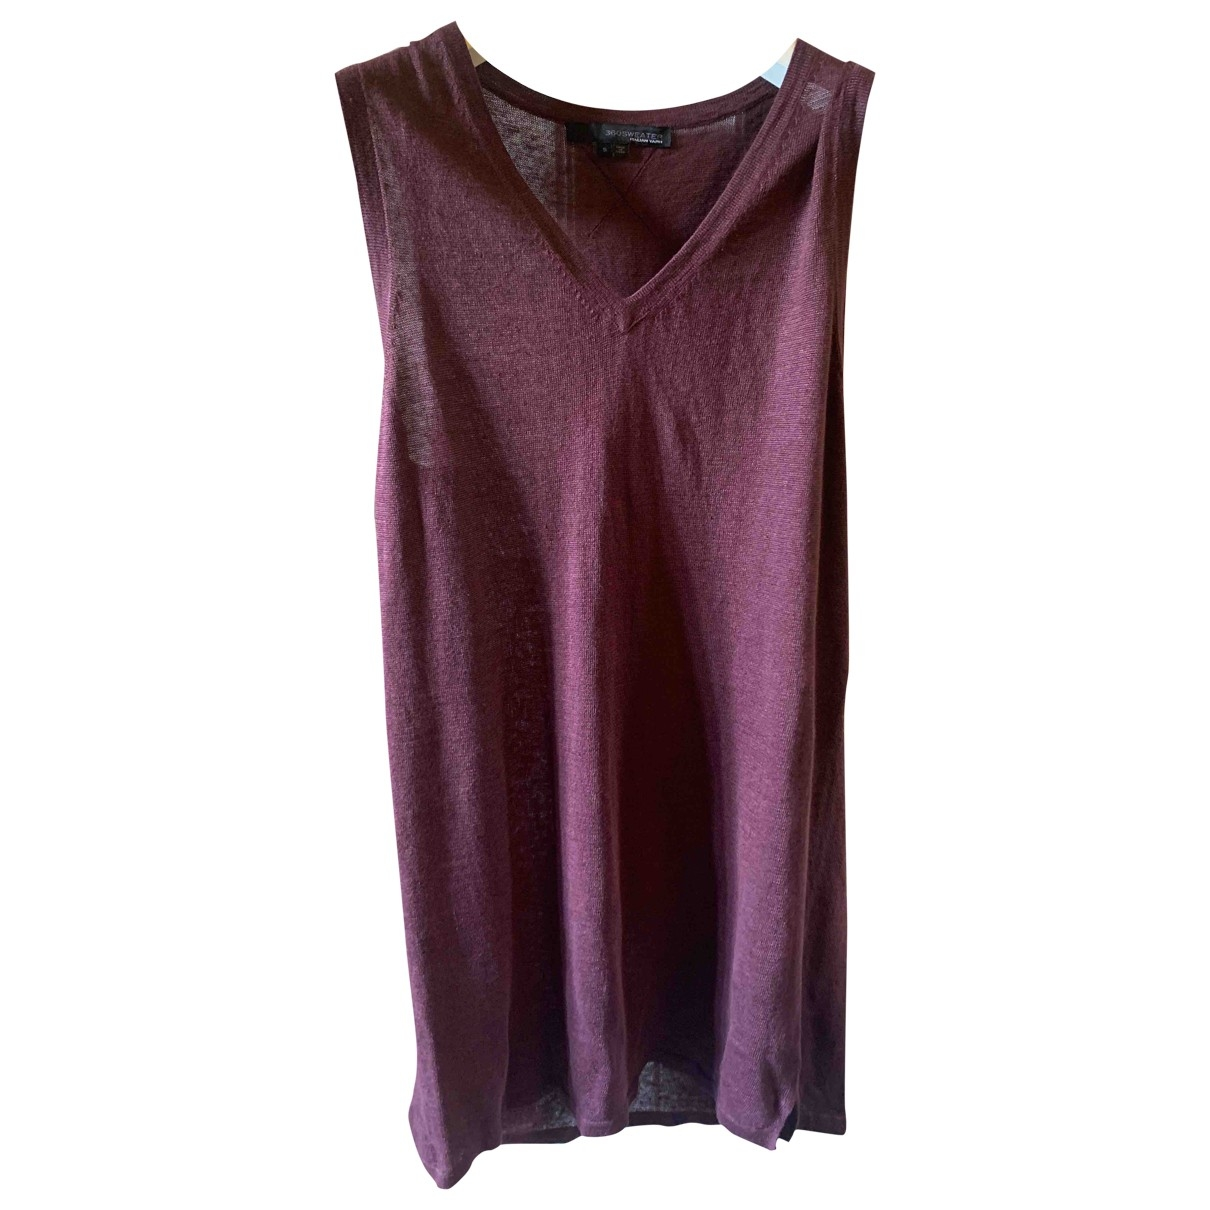 360 Sweater \N Burgundy Linen dress for Women S International